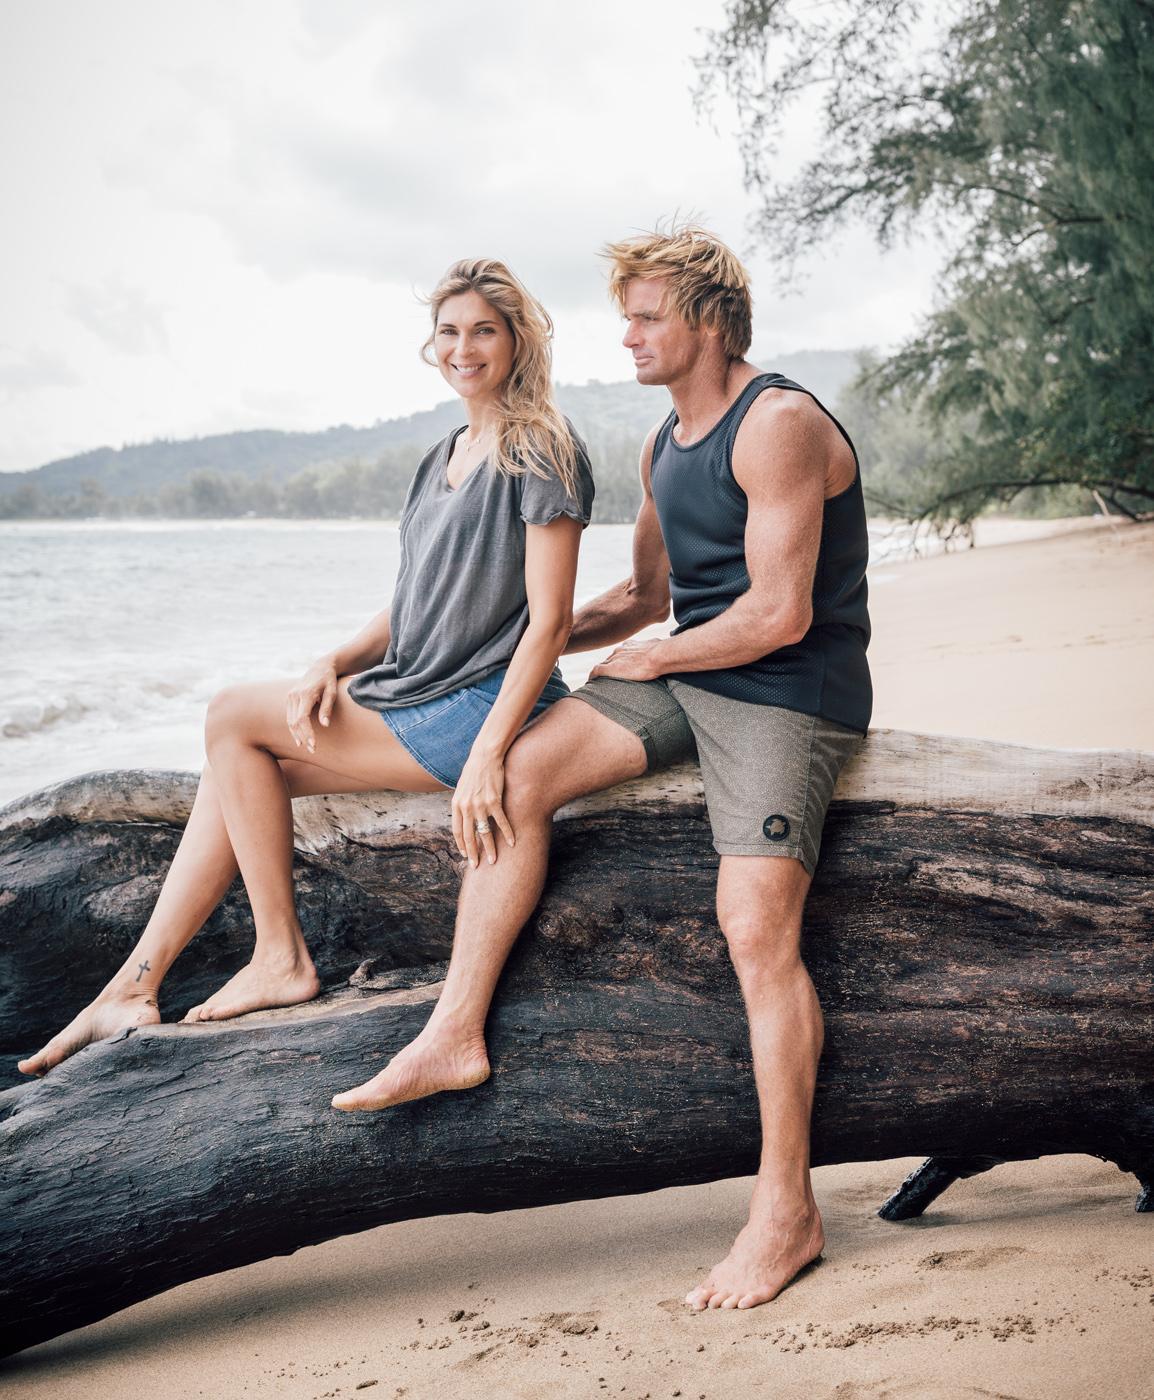 environmental portrait of Gabby Reece and Laird Hamilton